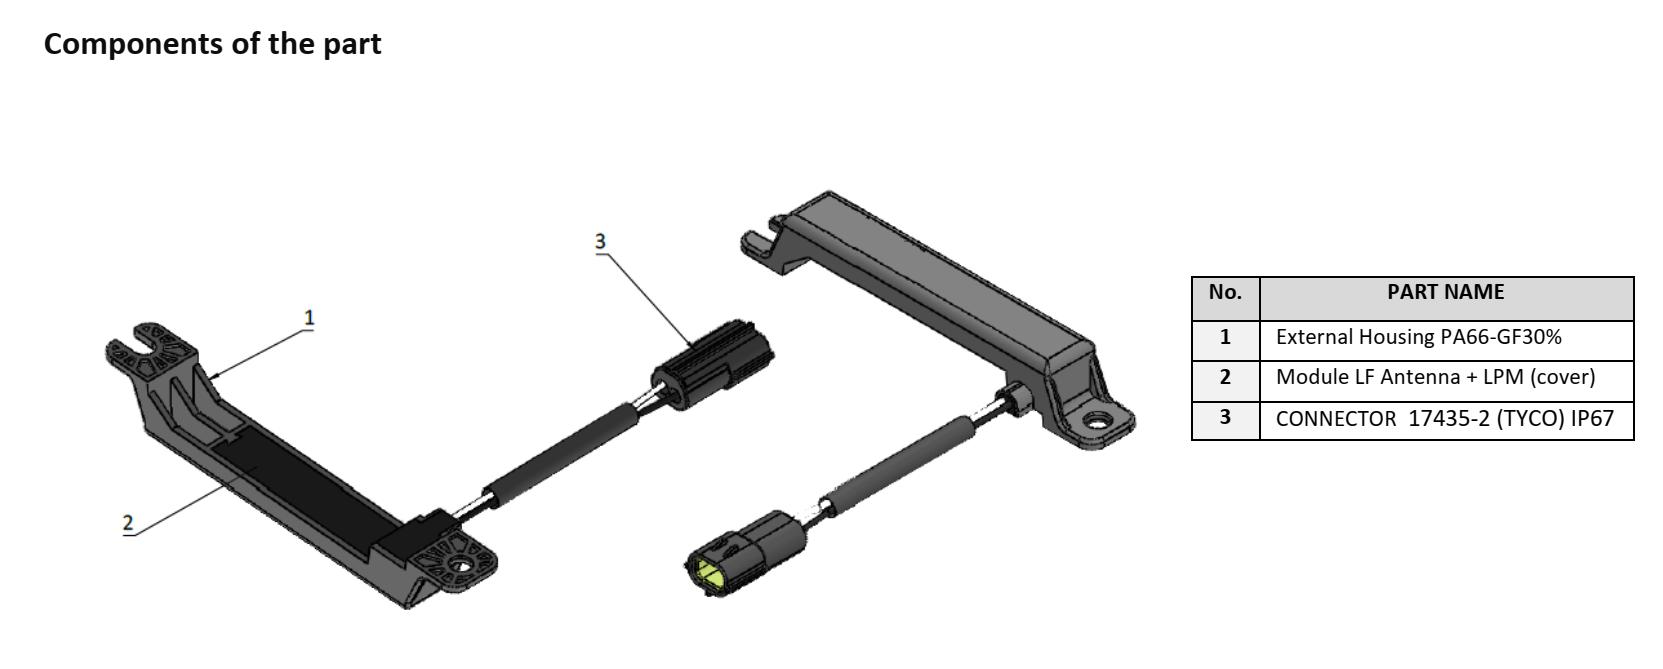 KGEA-HBB parts